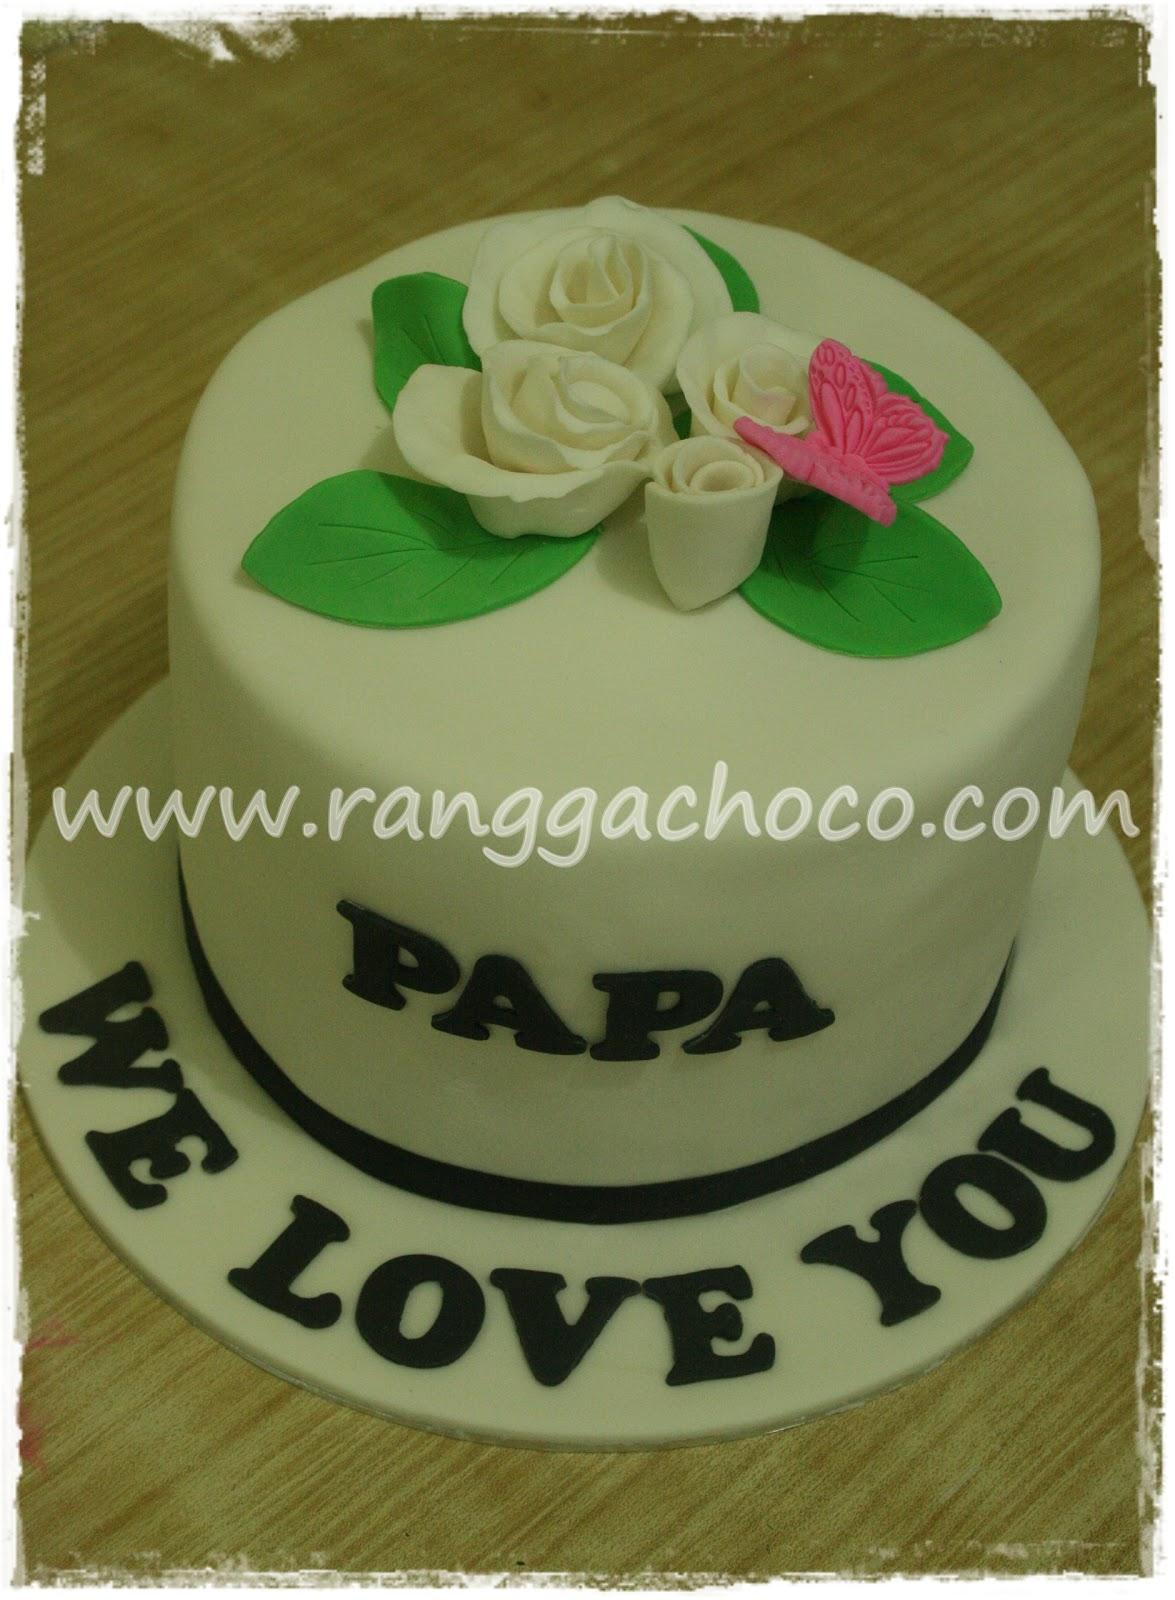 Images Of Papa Birthday Cake : Ranggachoco: White Roses Birthday Cake for Papa